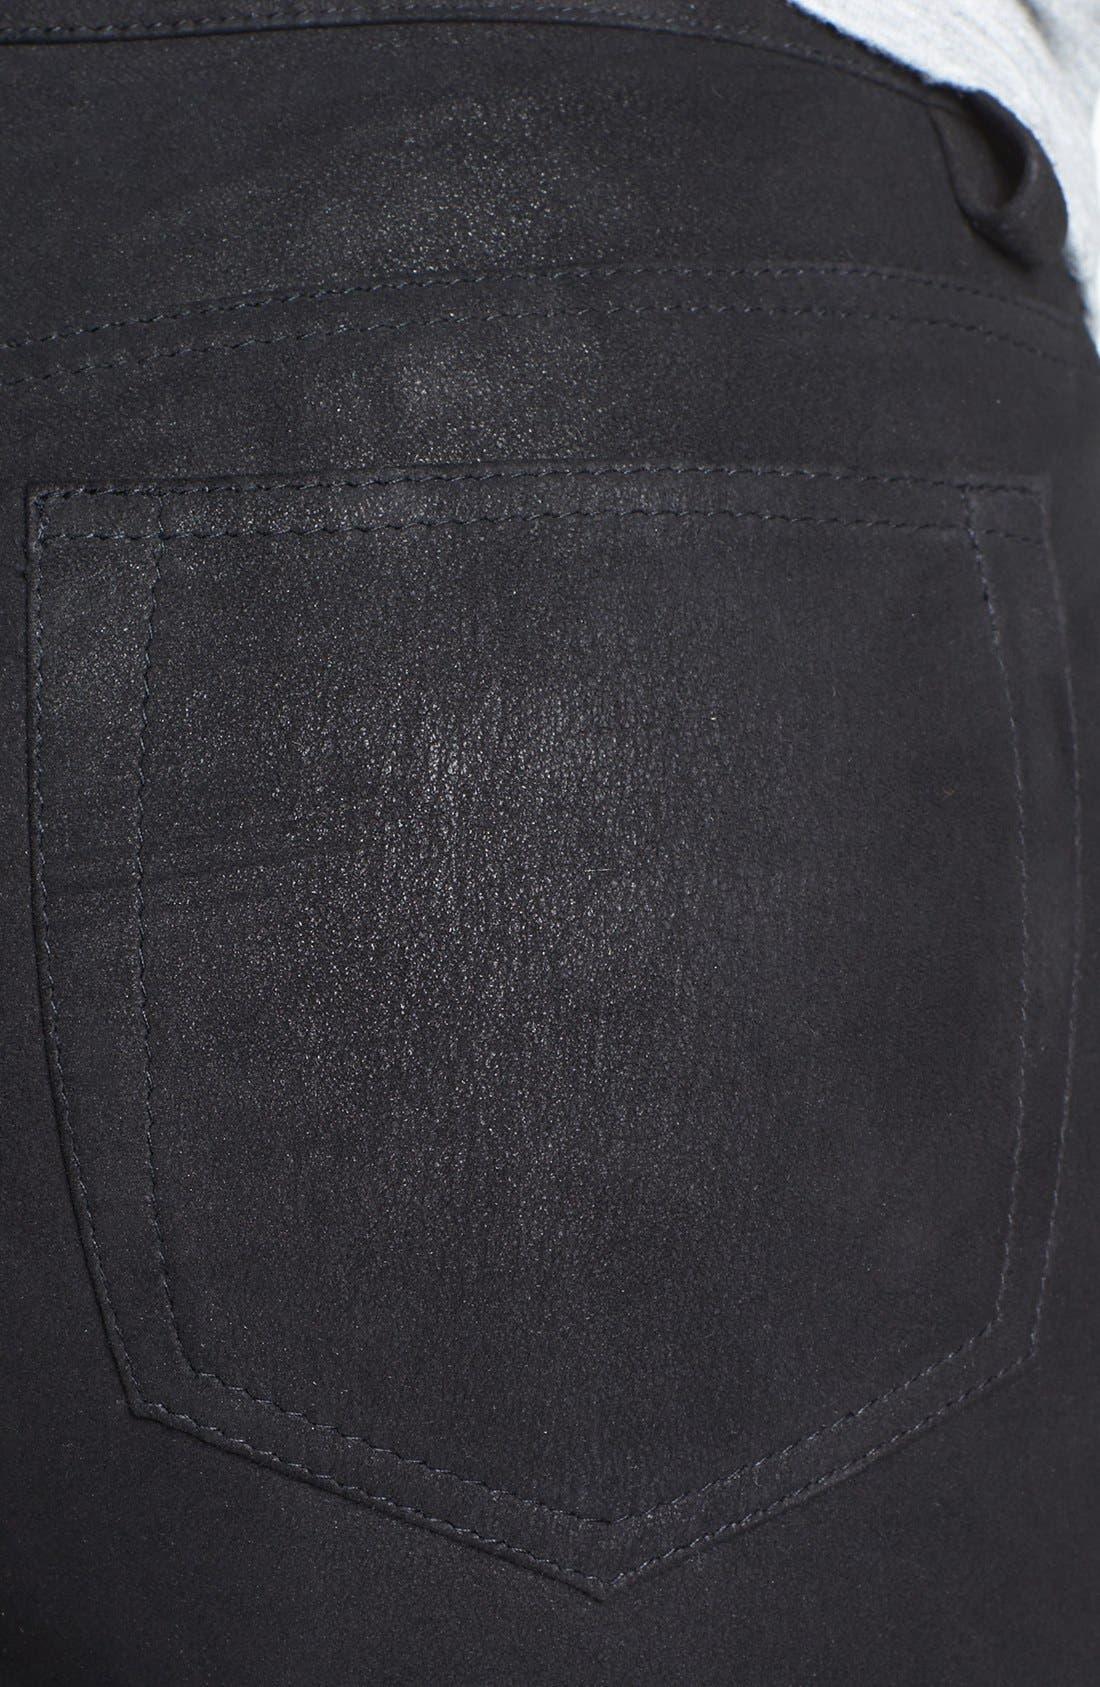 Alternate Image 3  - Joe's Tuxedo Skinny Suede Ankle Pants